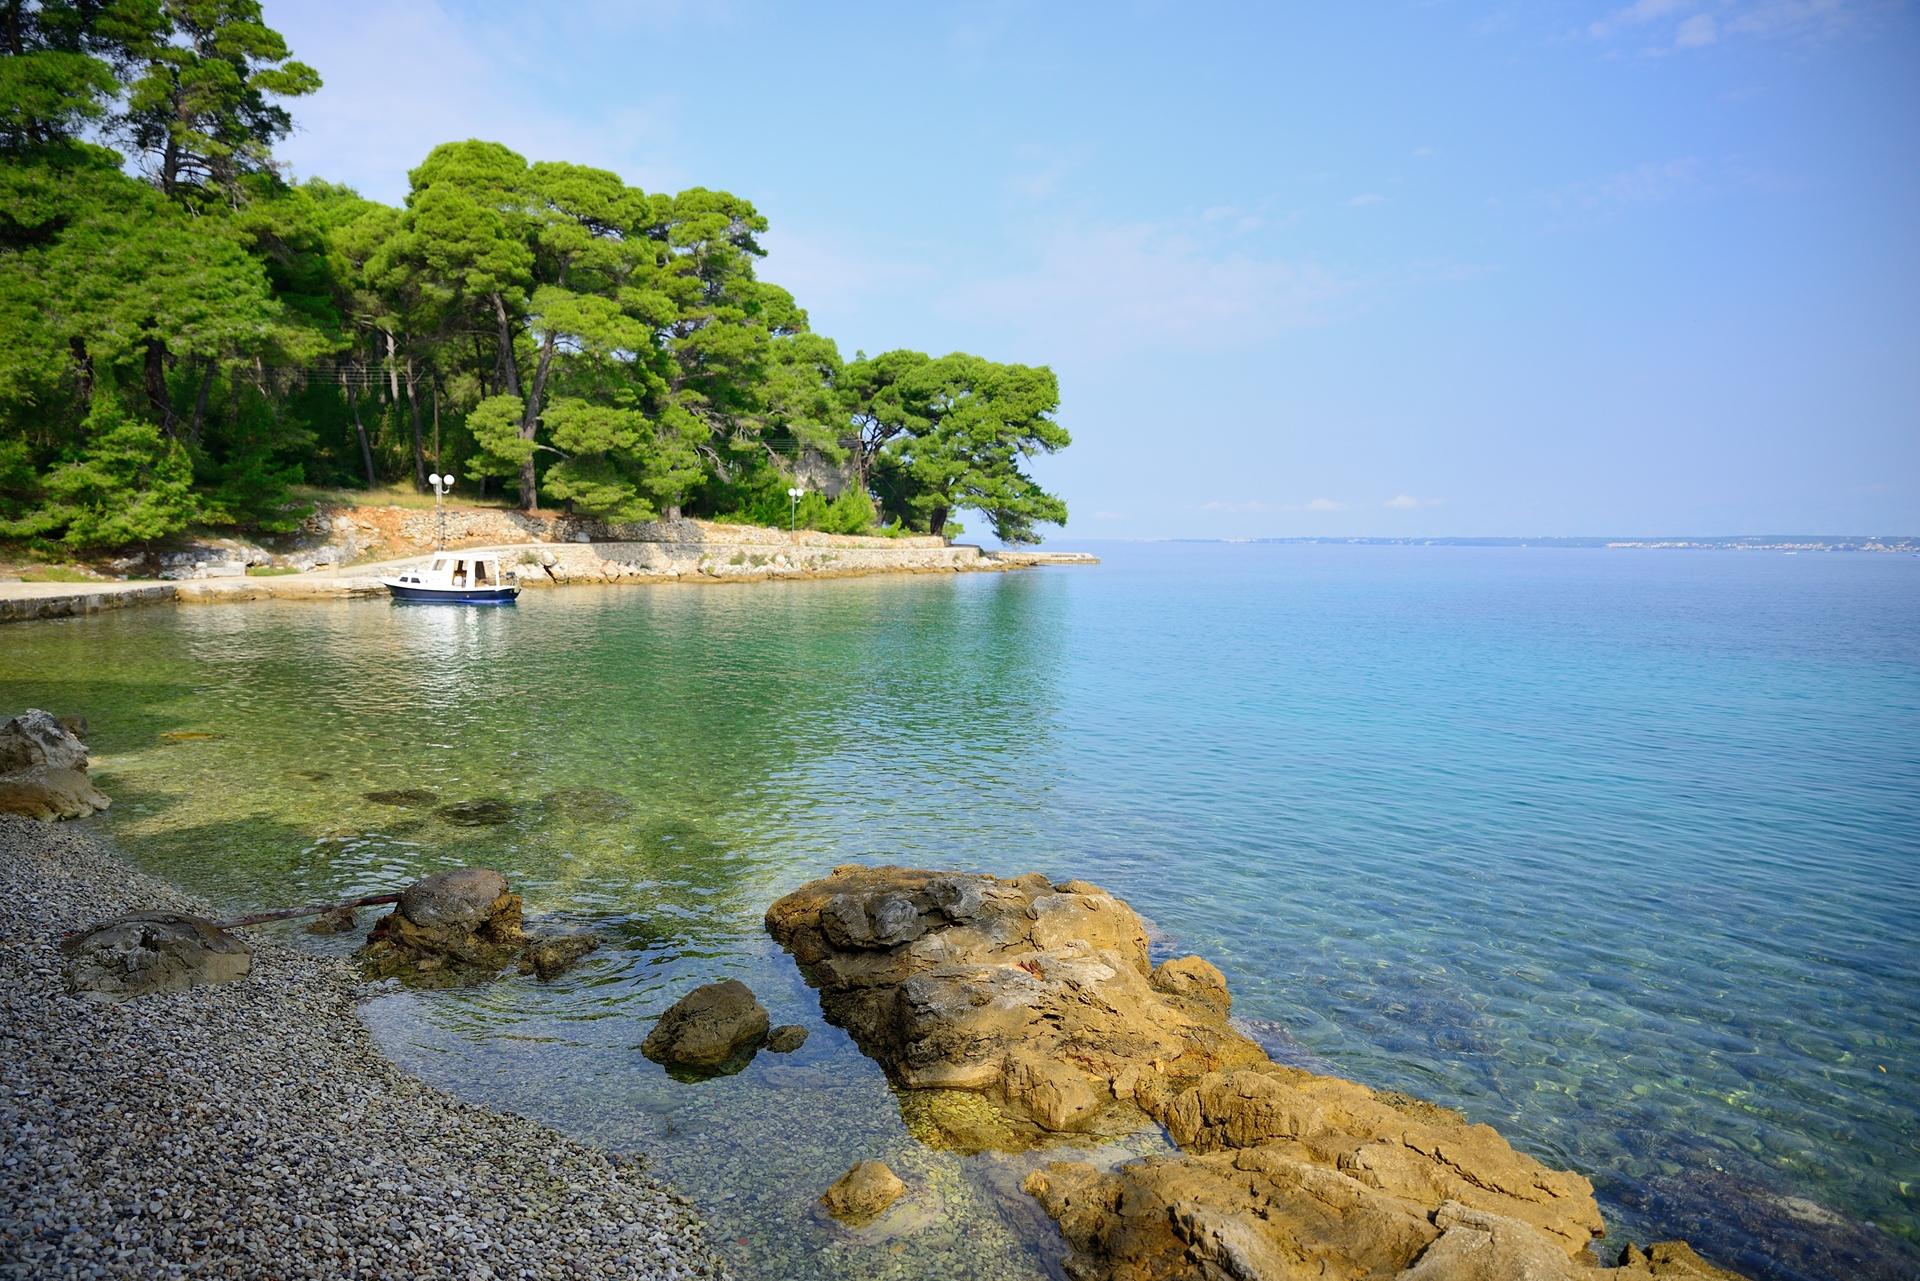 Martin - Lukoran - Vakantiehuizen, villa´s Kroatië - strand